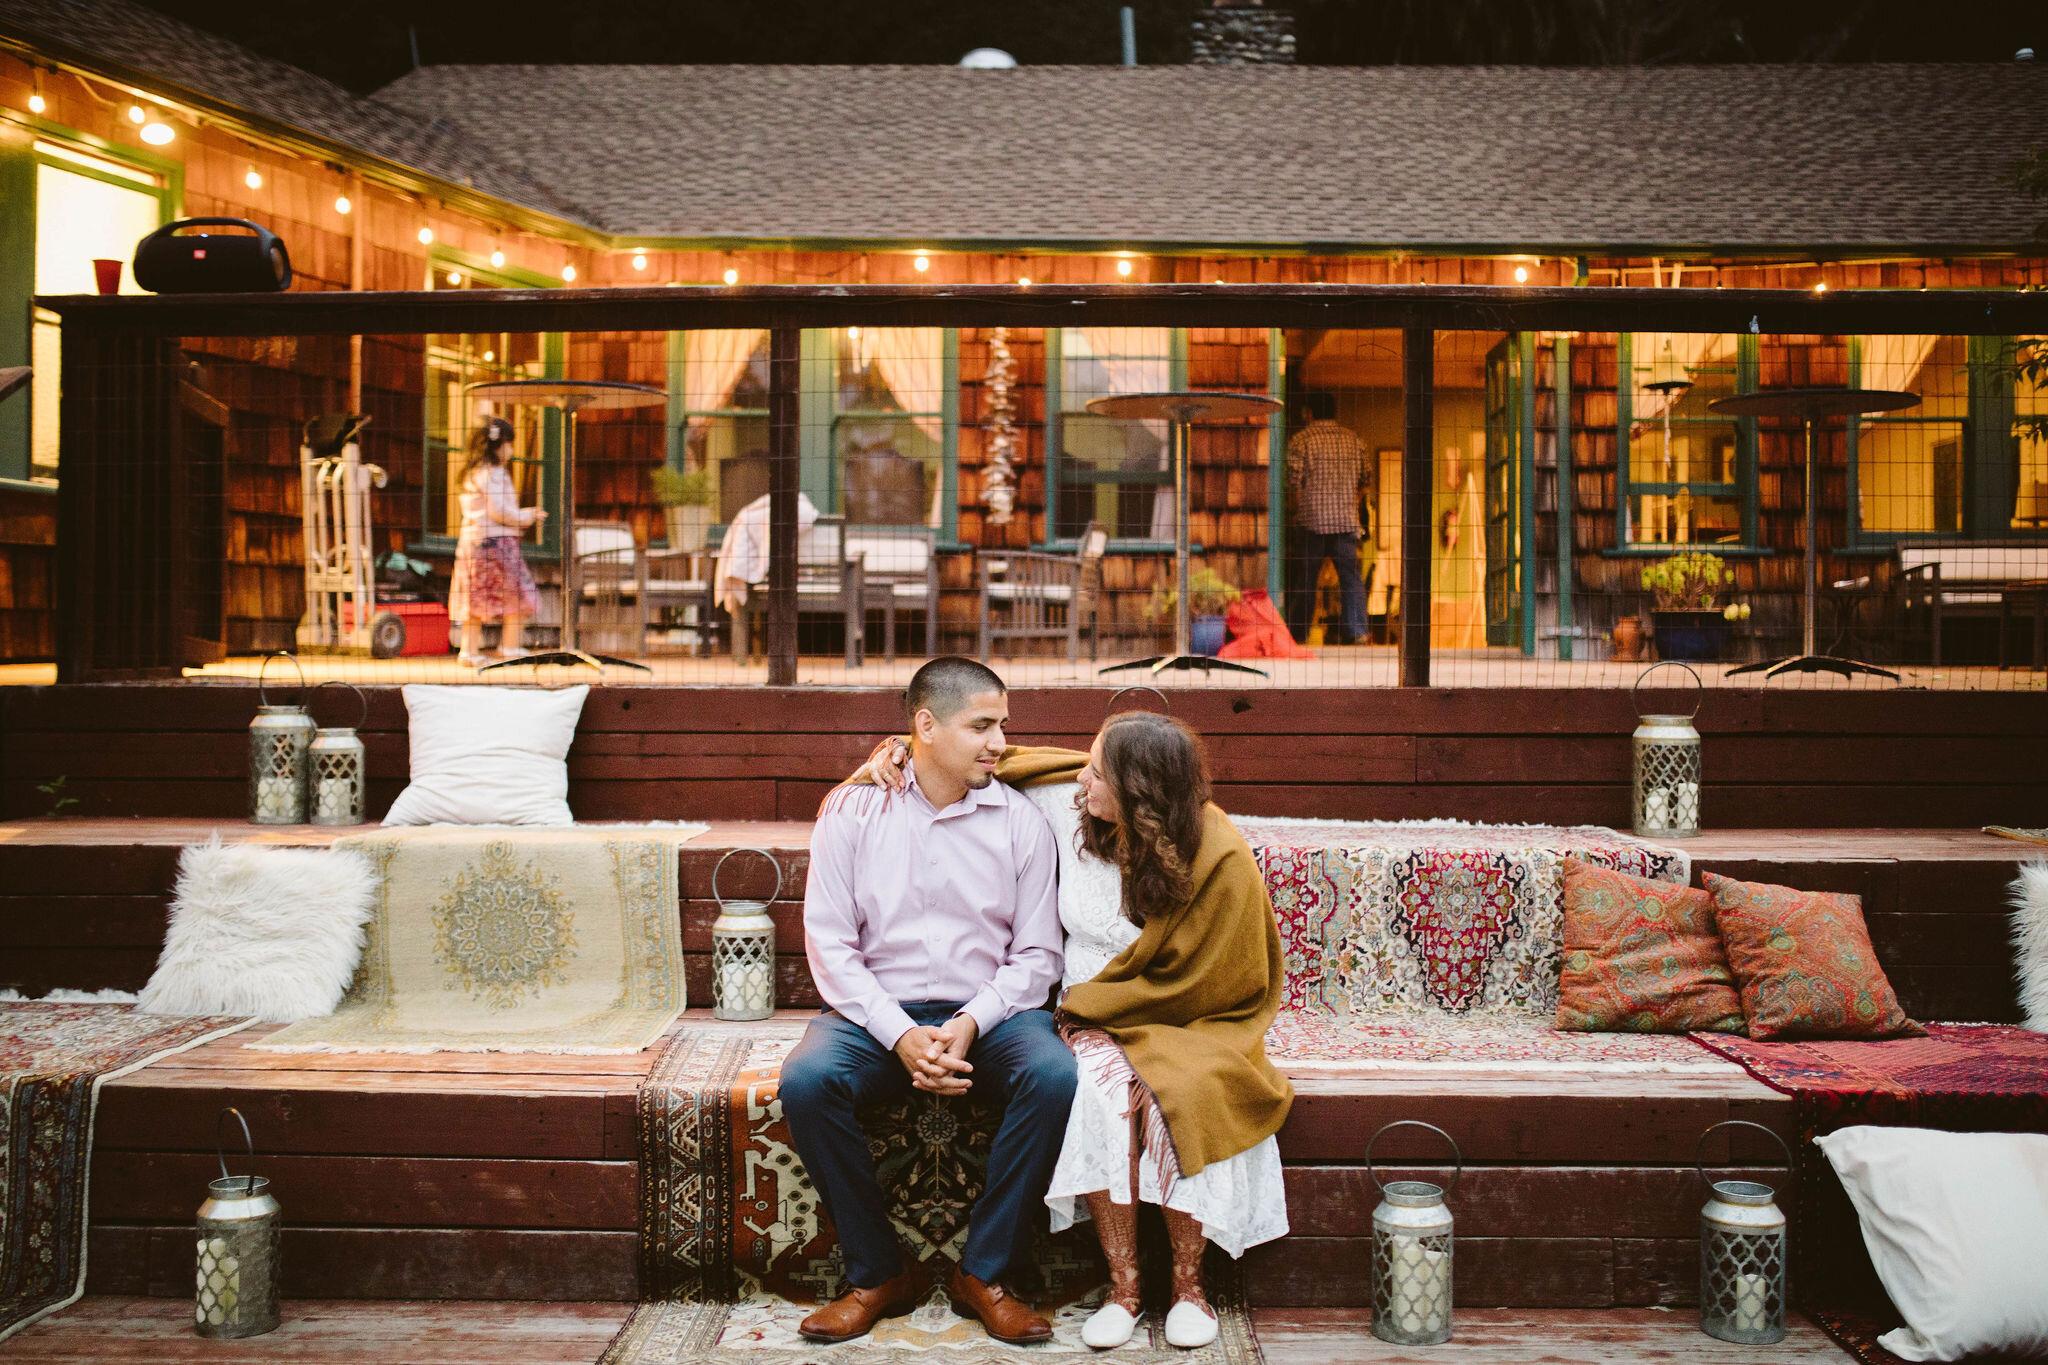 Venture-Retreat-Center-Wedding-Pescadero-Fri-Aaron-Pritam-The-Shalom-Imaginative-192.jpg